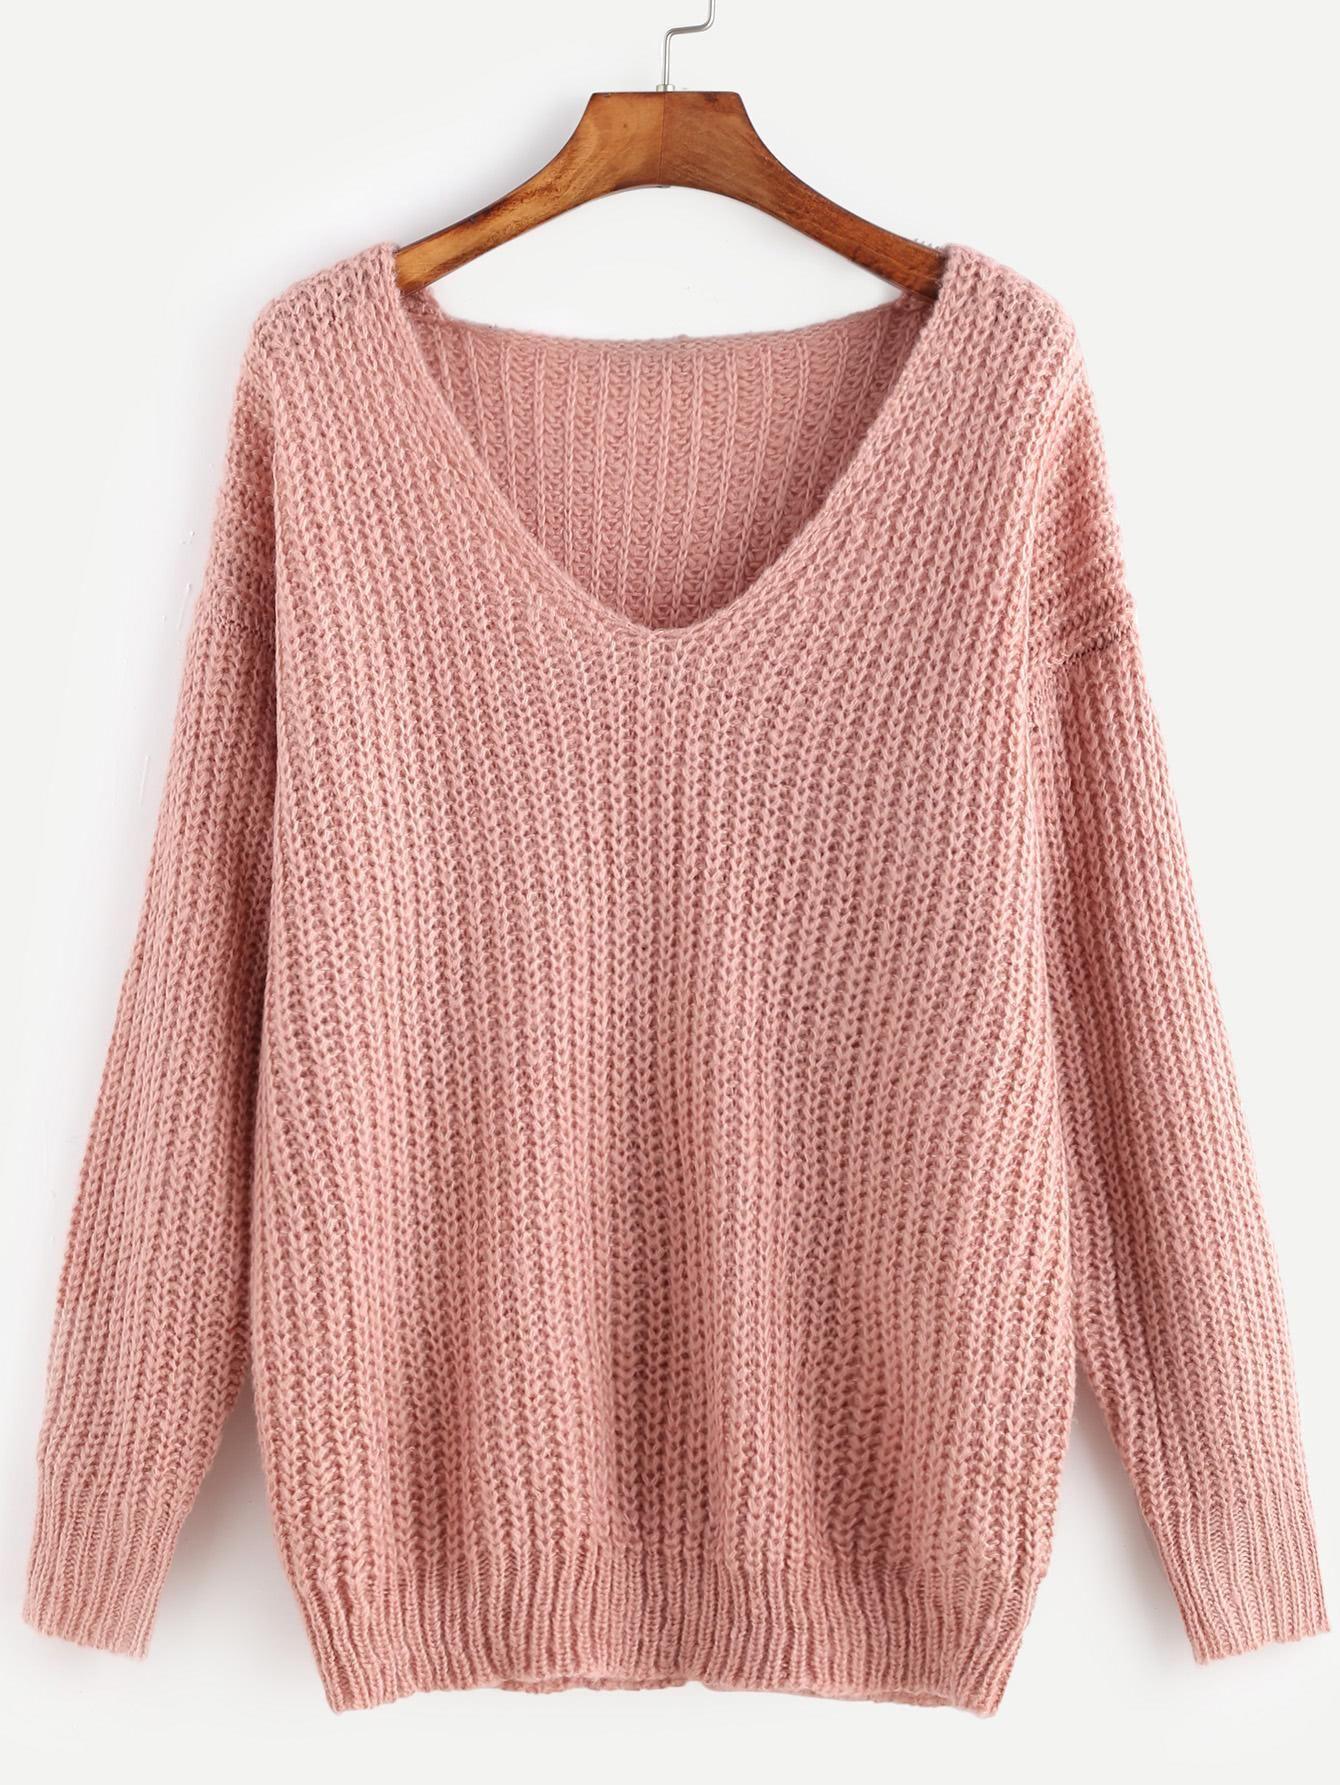 SheIn - SheIn Pink Ribbed Knit V Neck Drop Shoulder Sweater - AdoreWe.com